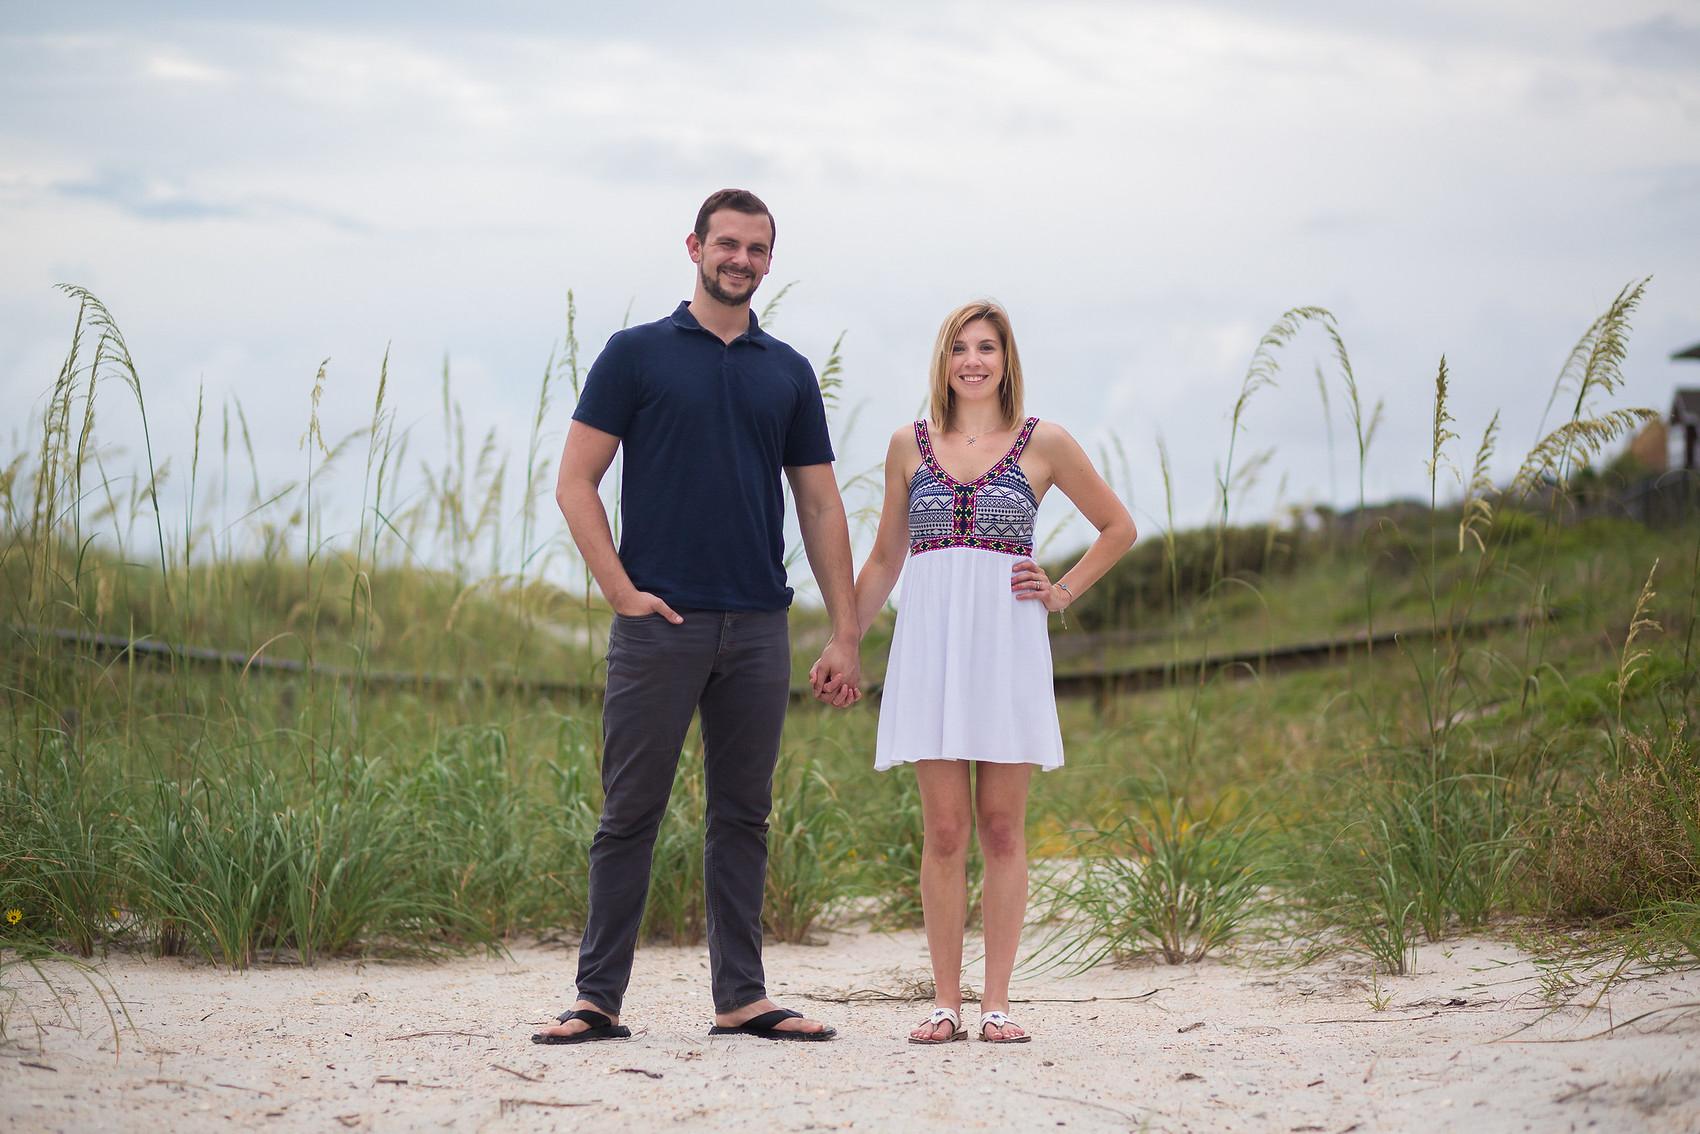 adam-szarmack-jacksonville-wedding-photographer-atlantic-beach-engagement-pictures-29.jpg